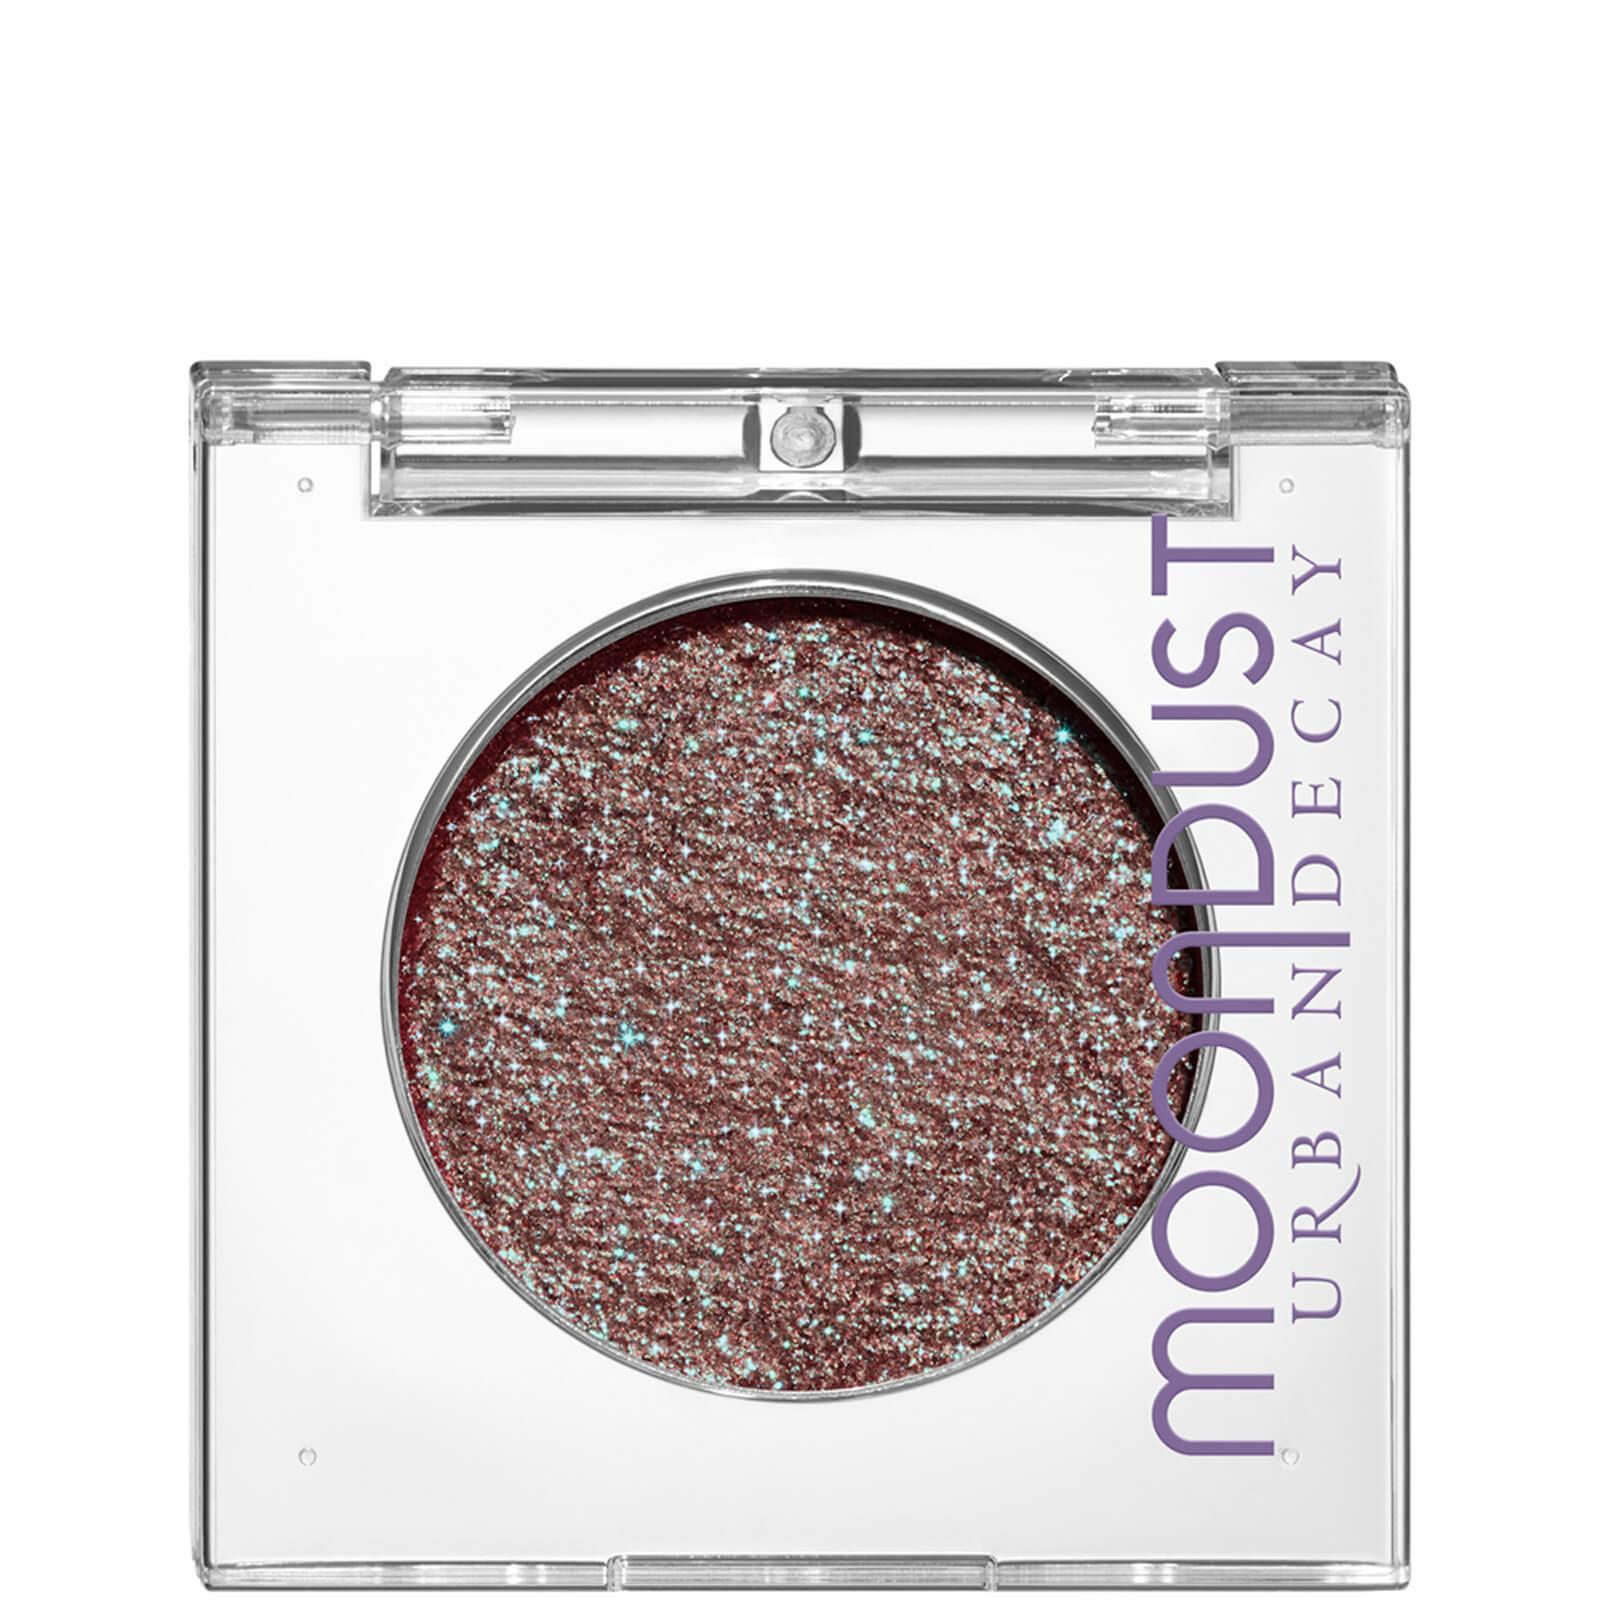 Купить Urban Decay 24/7 Eyeshadow Mono Moondust (Various Shades) - Solstice